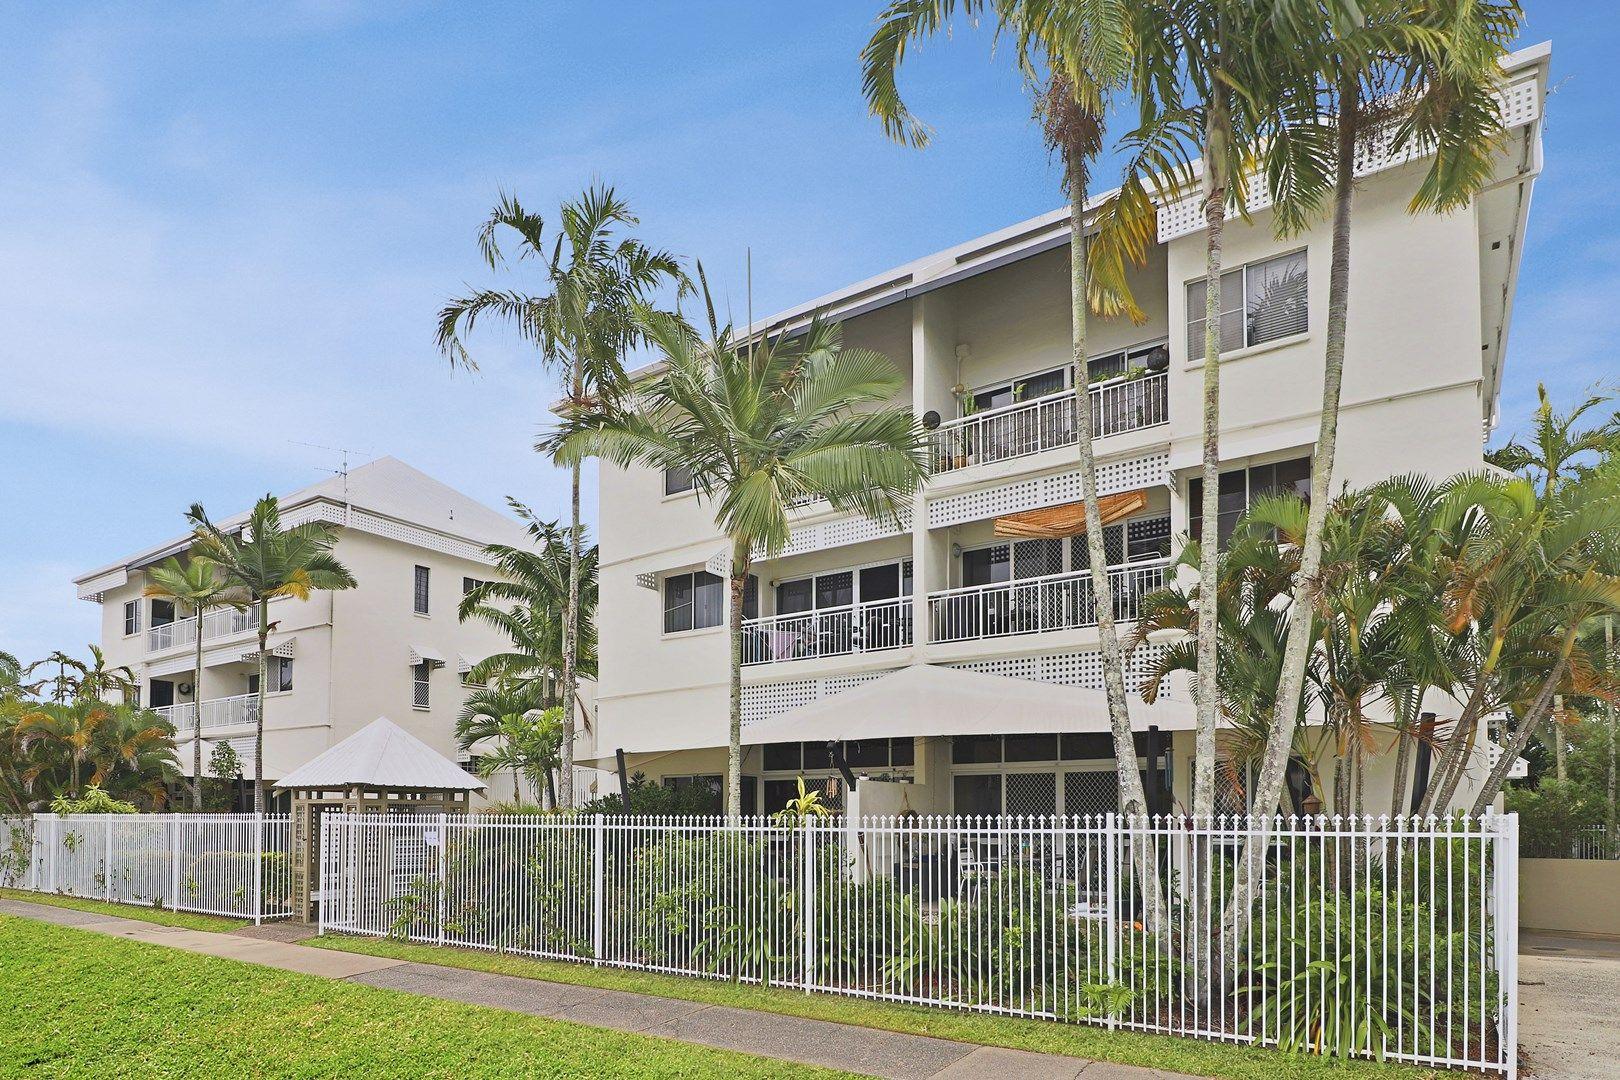 21/208 Grafton Street, Cairns North QLD 4870, Image 0